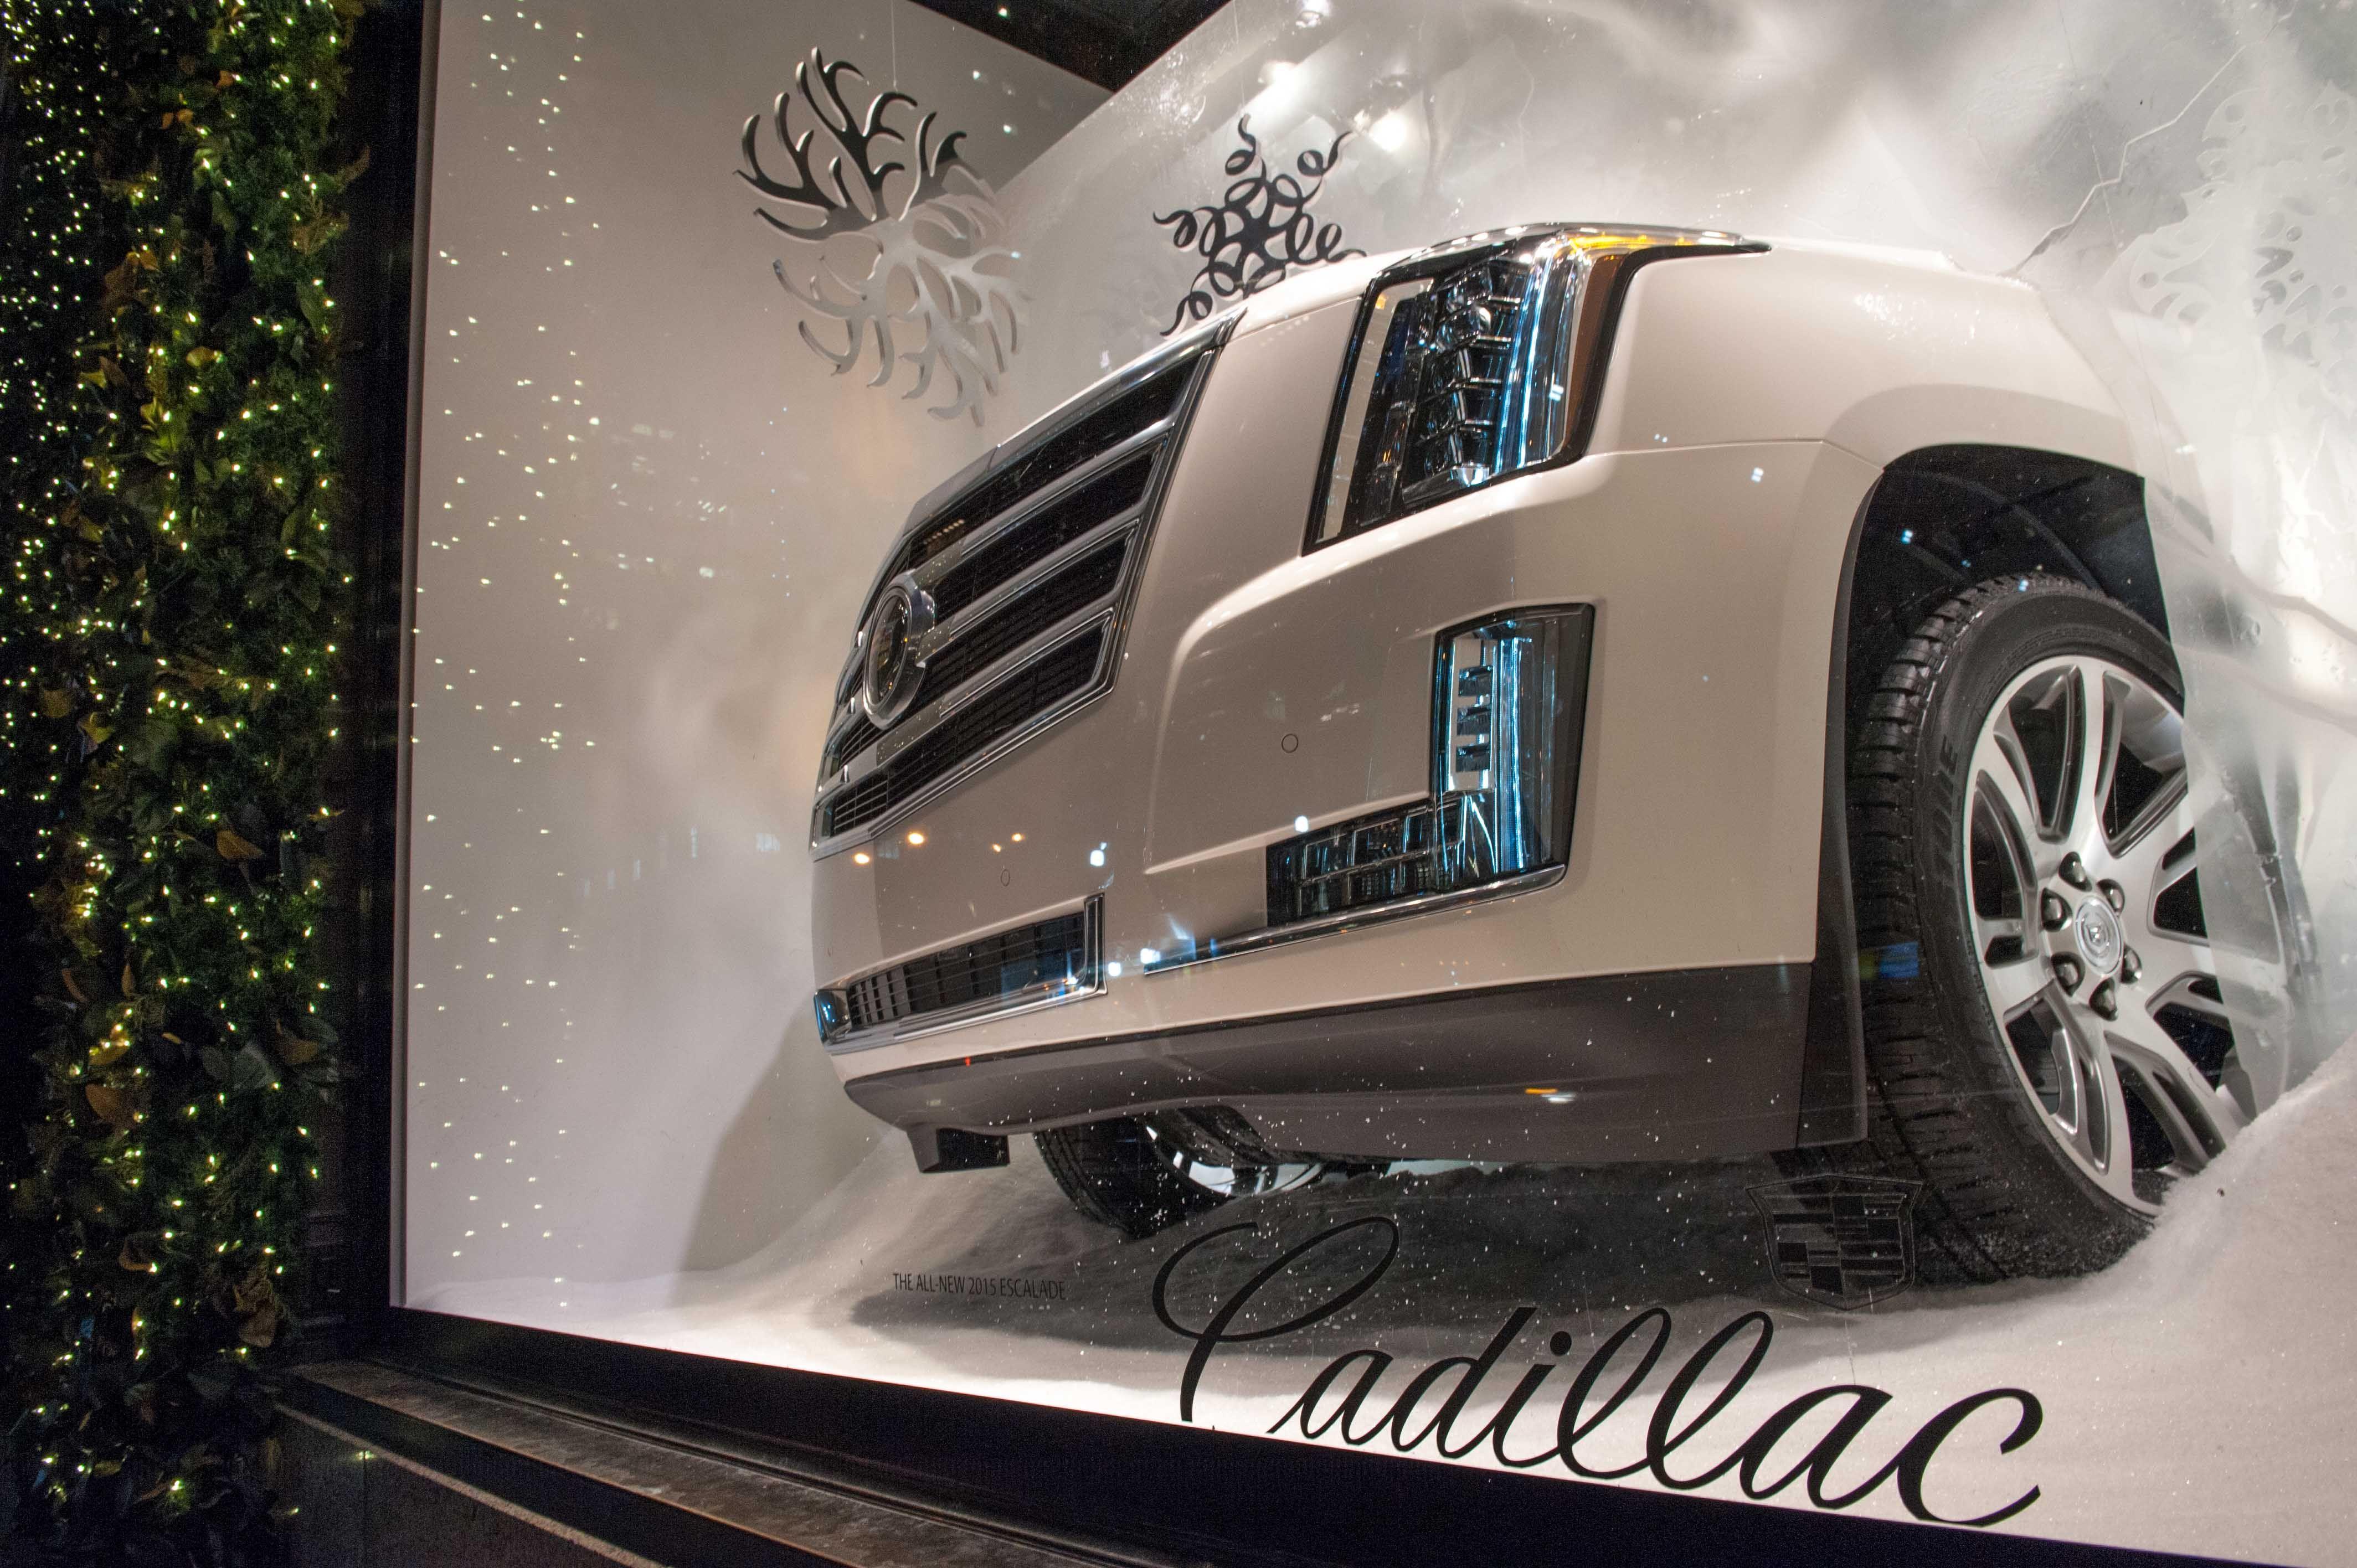 Pin On Cadillac Experiences